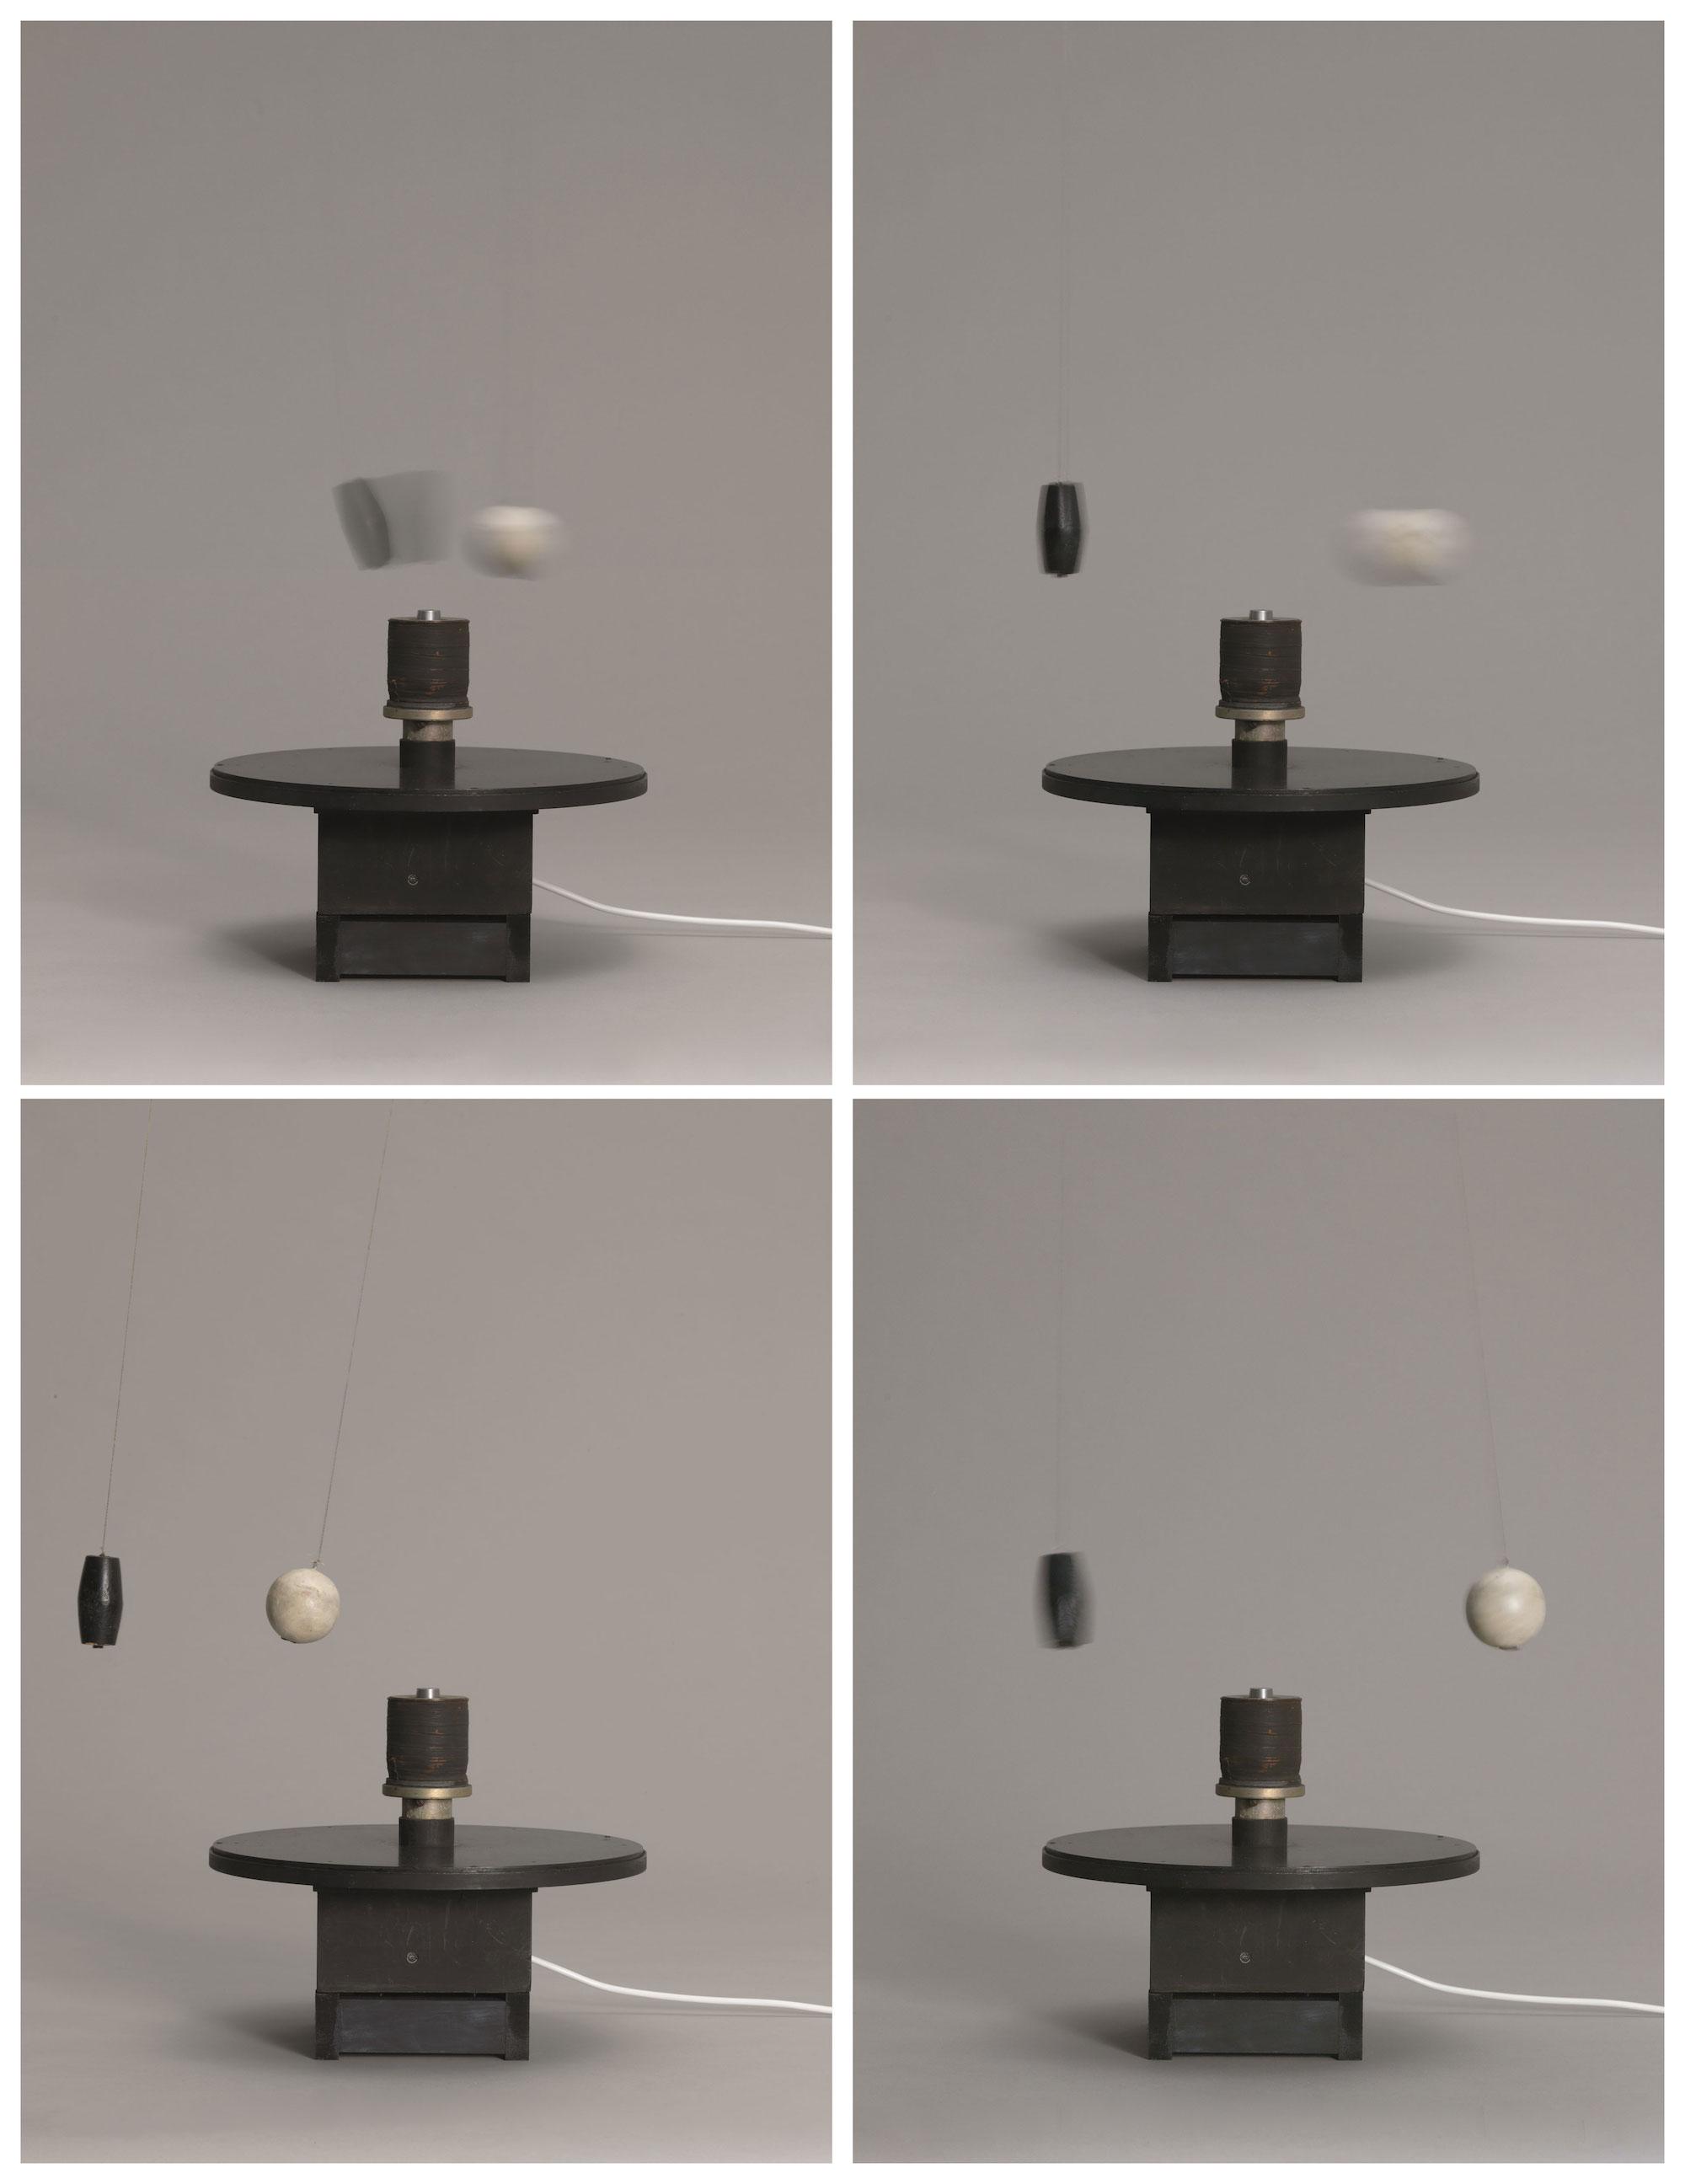 Magnetic Fields (detail), 1969. Solomon R. Guggenheim Museum, New York. Partial gift, Robert Spitzer, by exchange, 1970. Photo : Solomon R. Guggenheim Museum, New York.